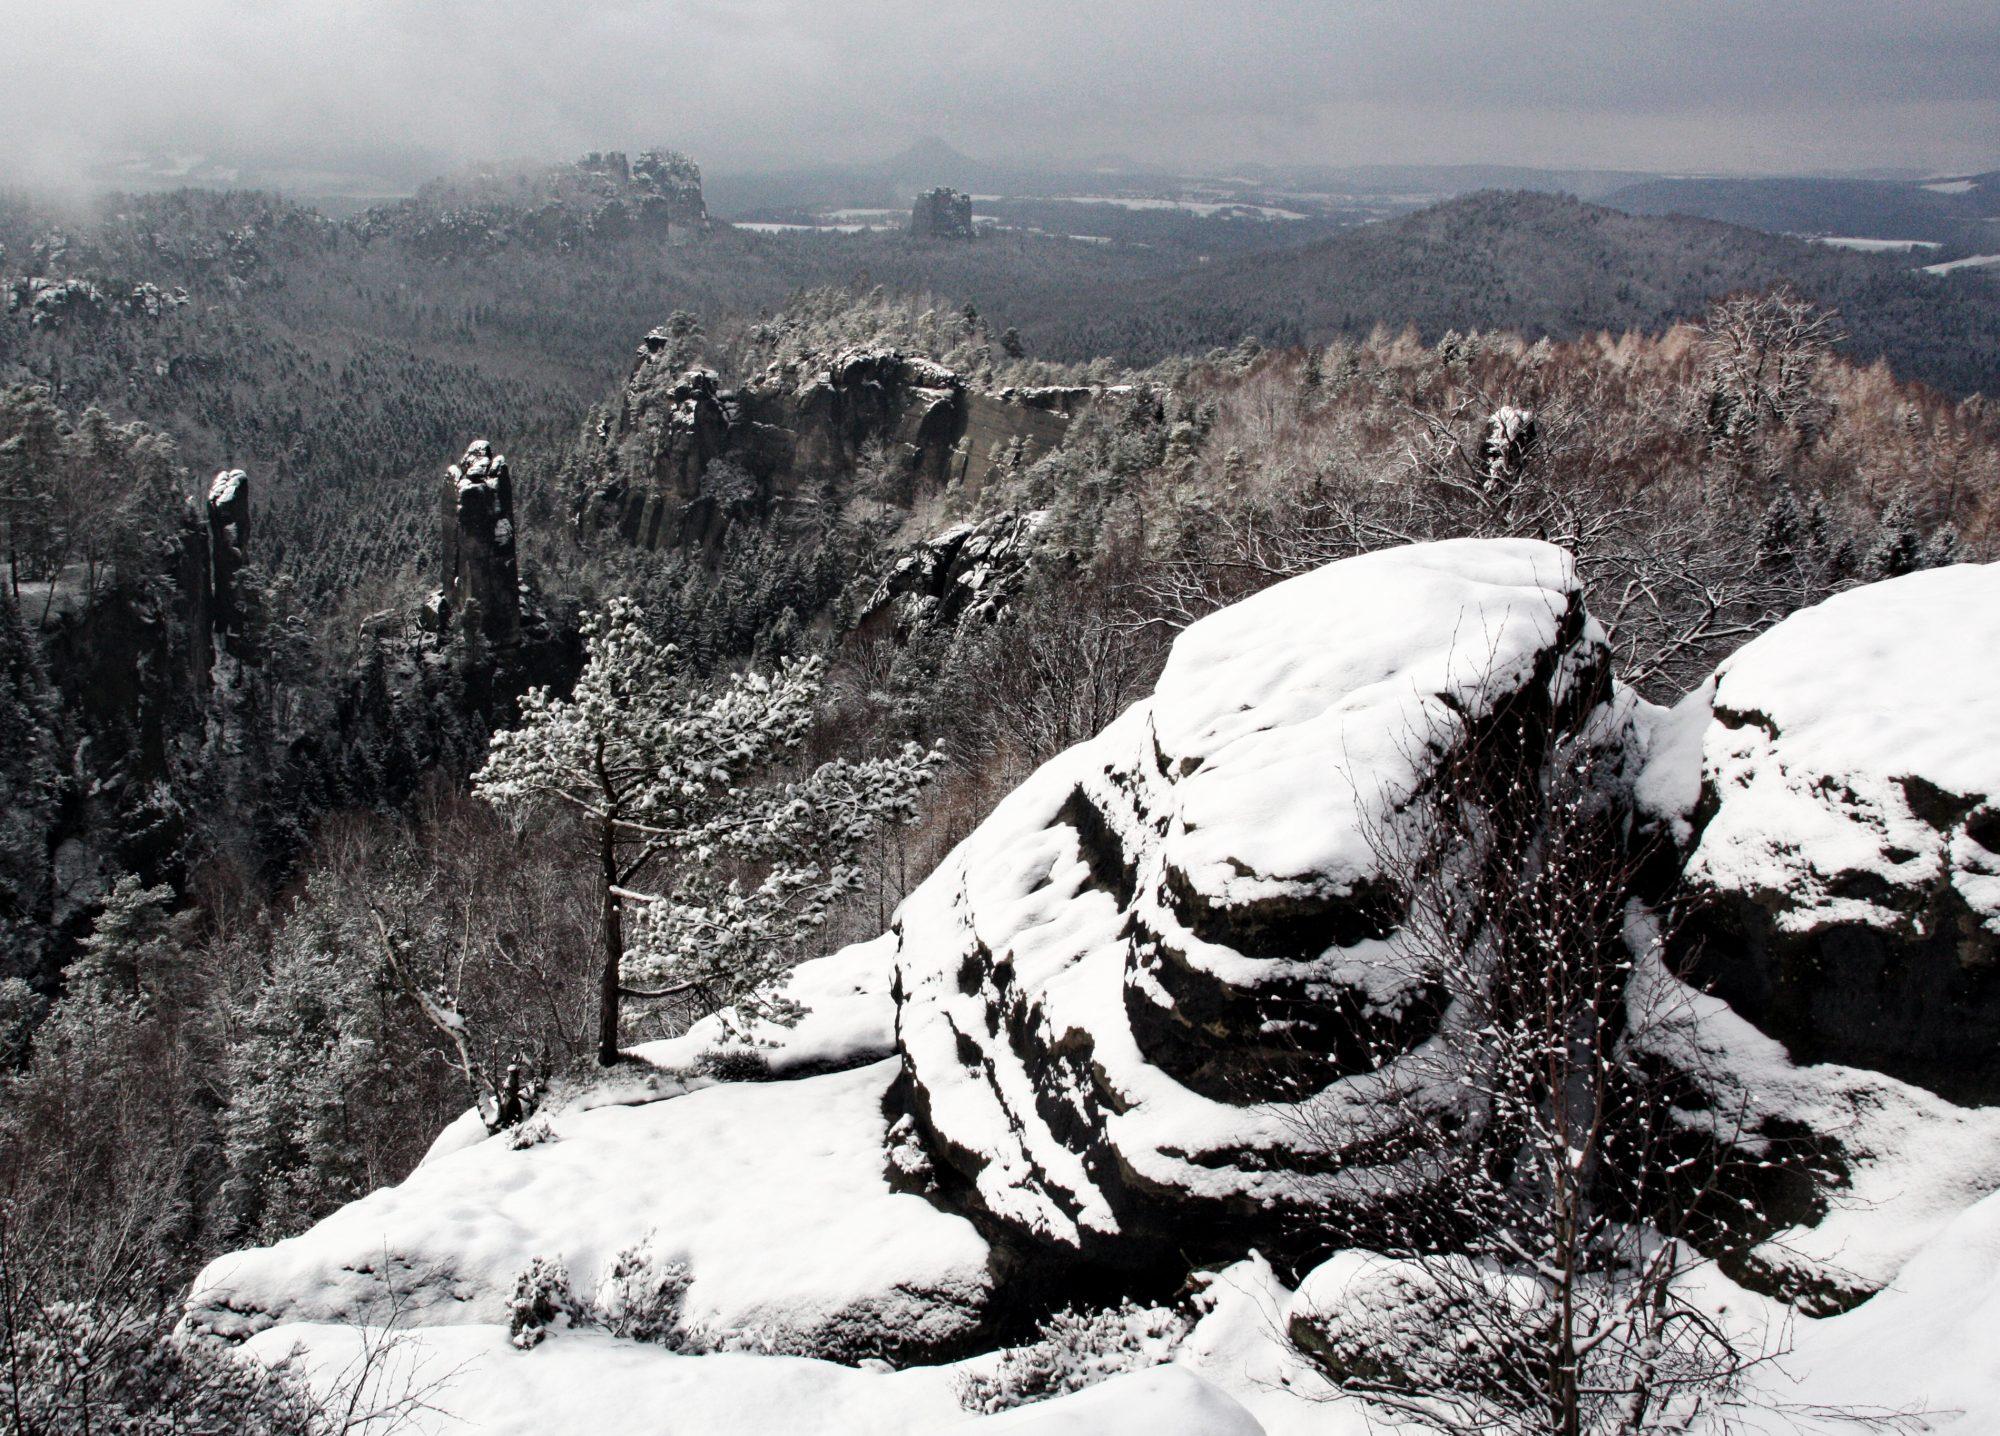 Carolafelsen, Elbsandsteingebirge, Sächsische Schweiz, Wandern, Wandertour